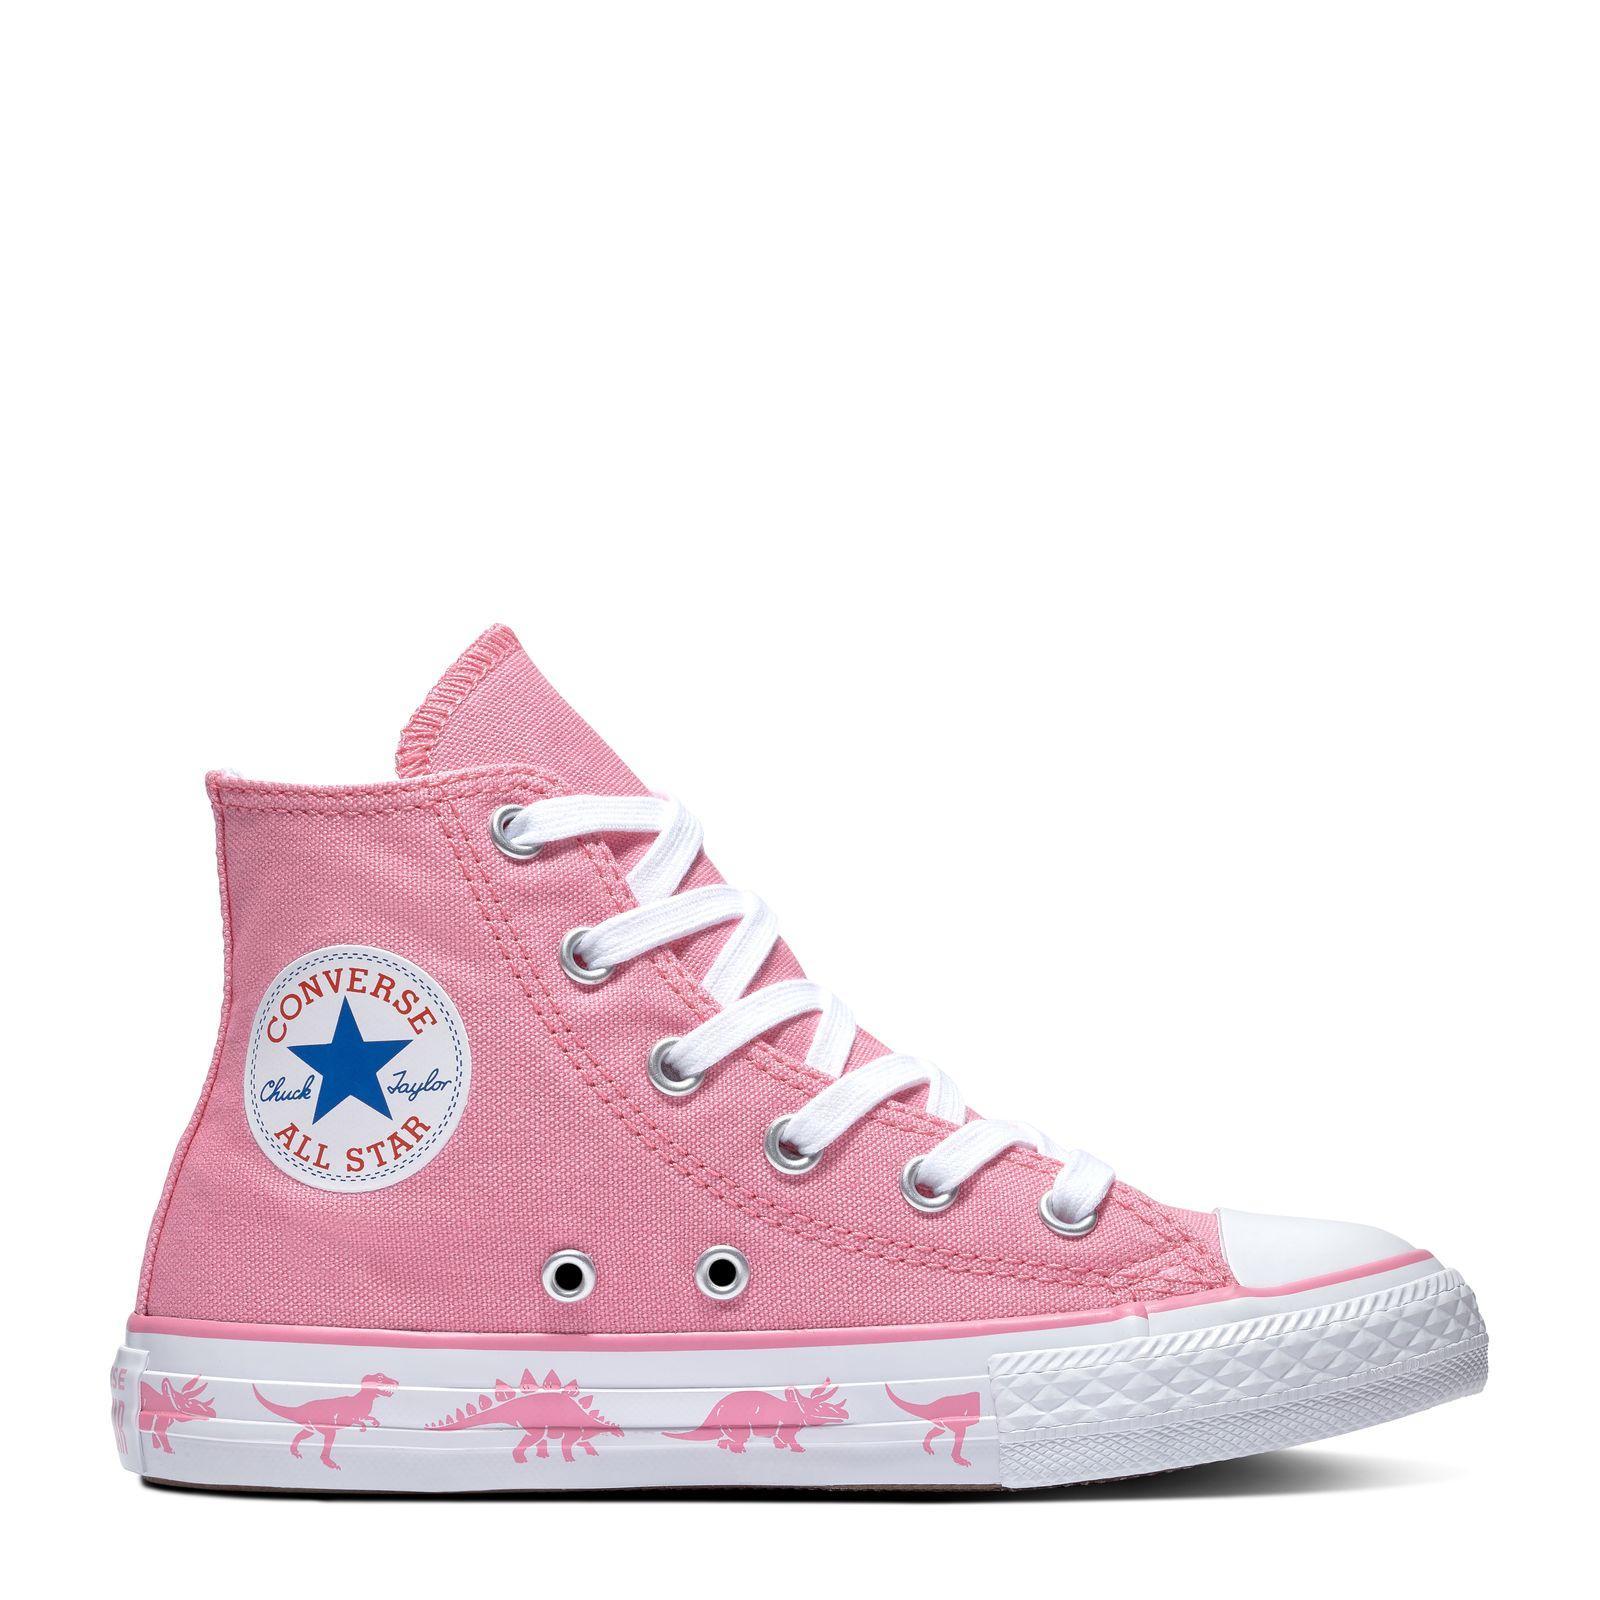 CONVERSE CHUCK TAYLOR ALL STAR - HI - PINK WHITE WHITE - CON663712C 8447383dd3